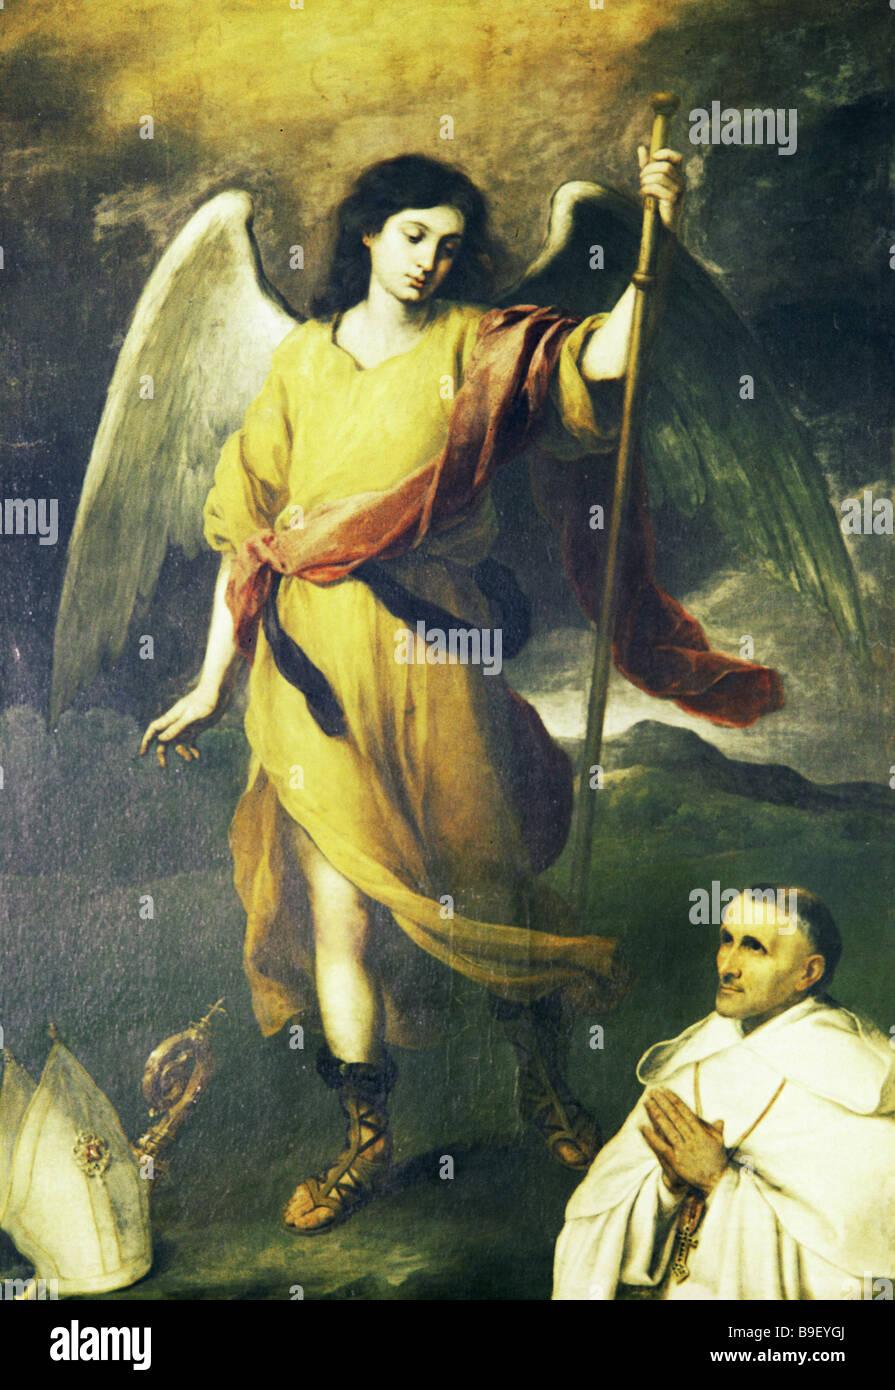 Bartolome Esteban Murillo Archangel Raphael and Bishop Domonte Pushkin Museum of Fine Arts Reproduction - Stock Image